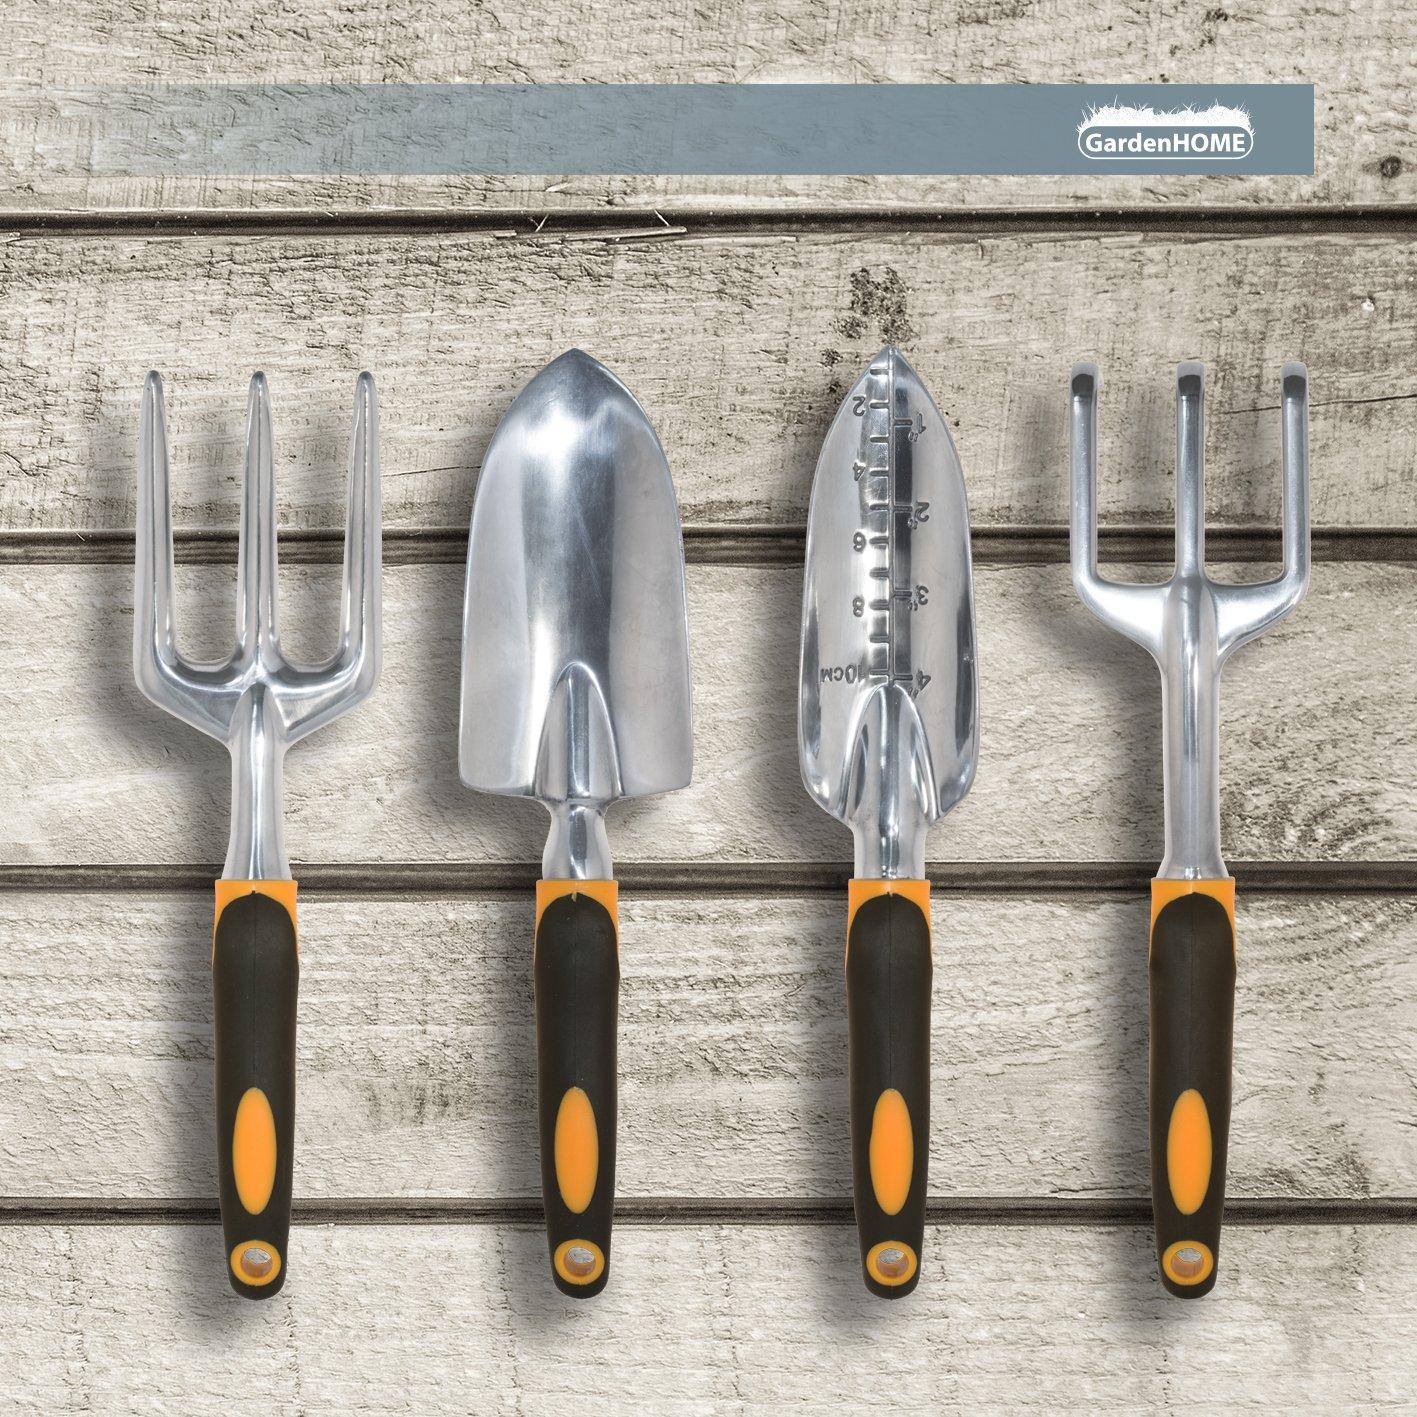 GardenHOME Ergonomic Garden Tools 4 Piece Tool Set with Trowel,  Cultivator, Transplanter and  Weeding Fork